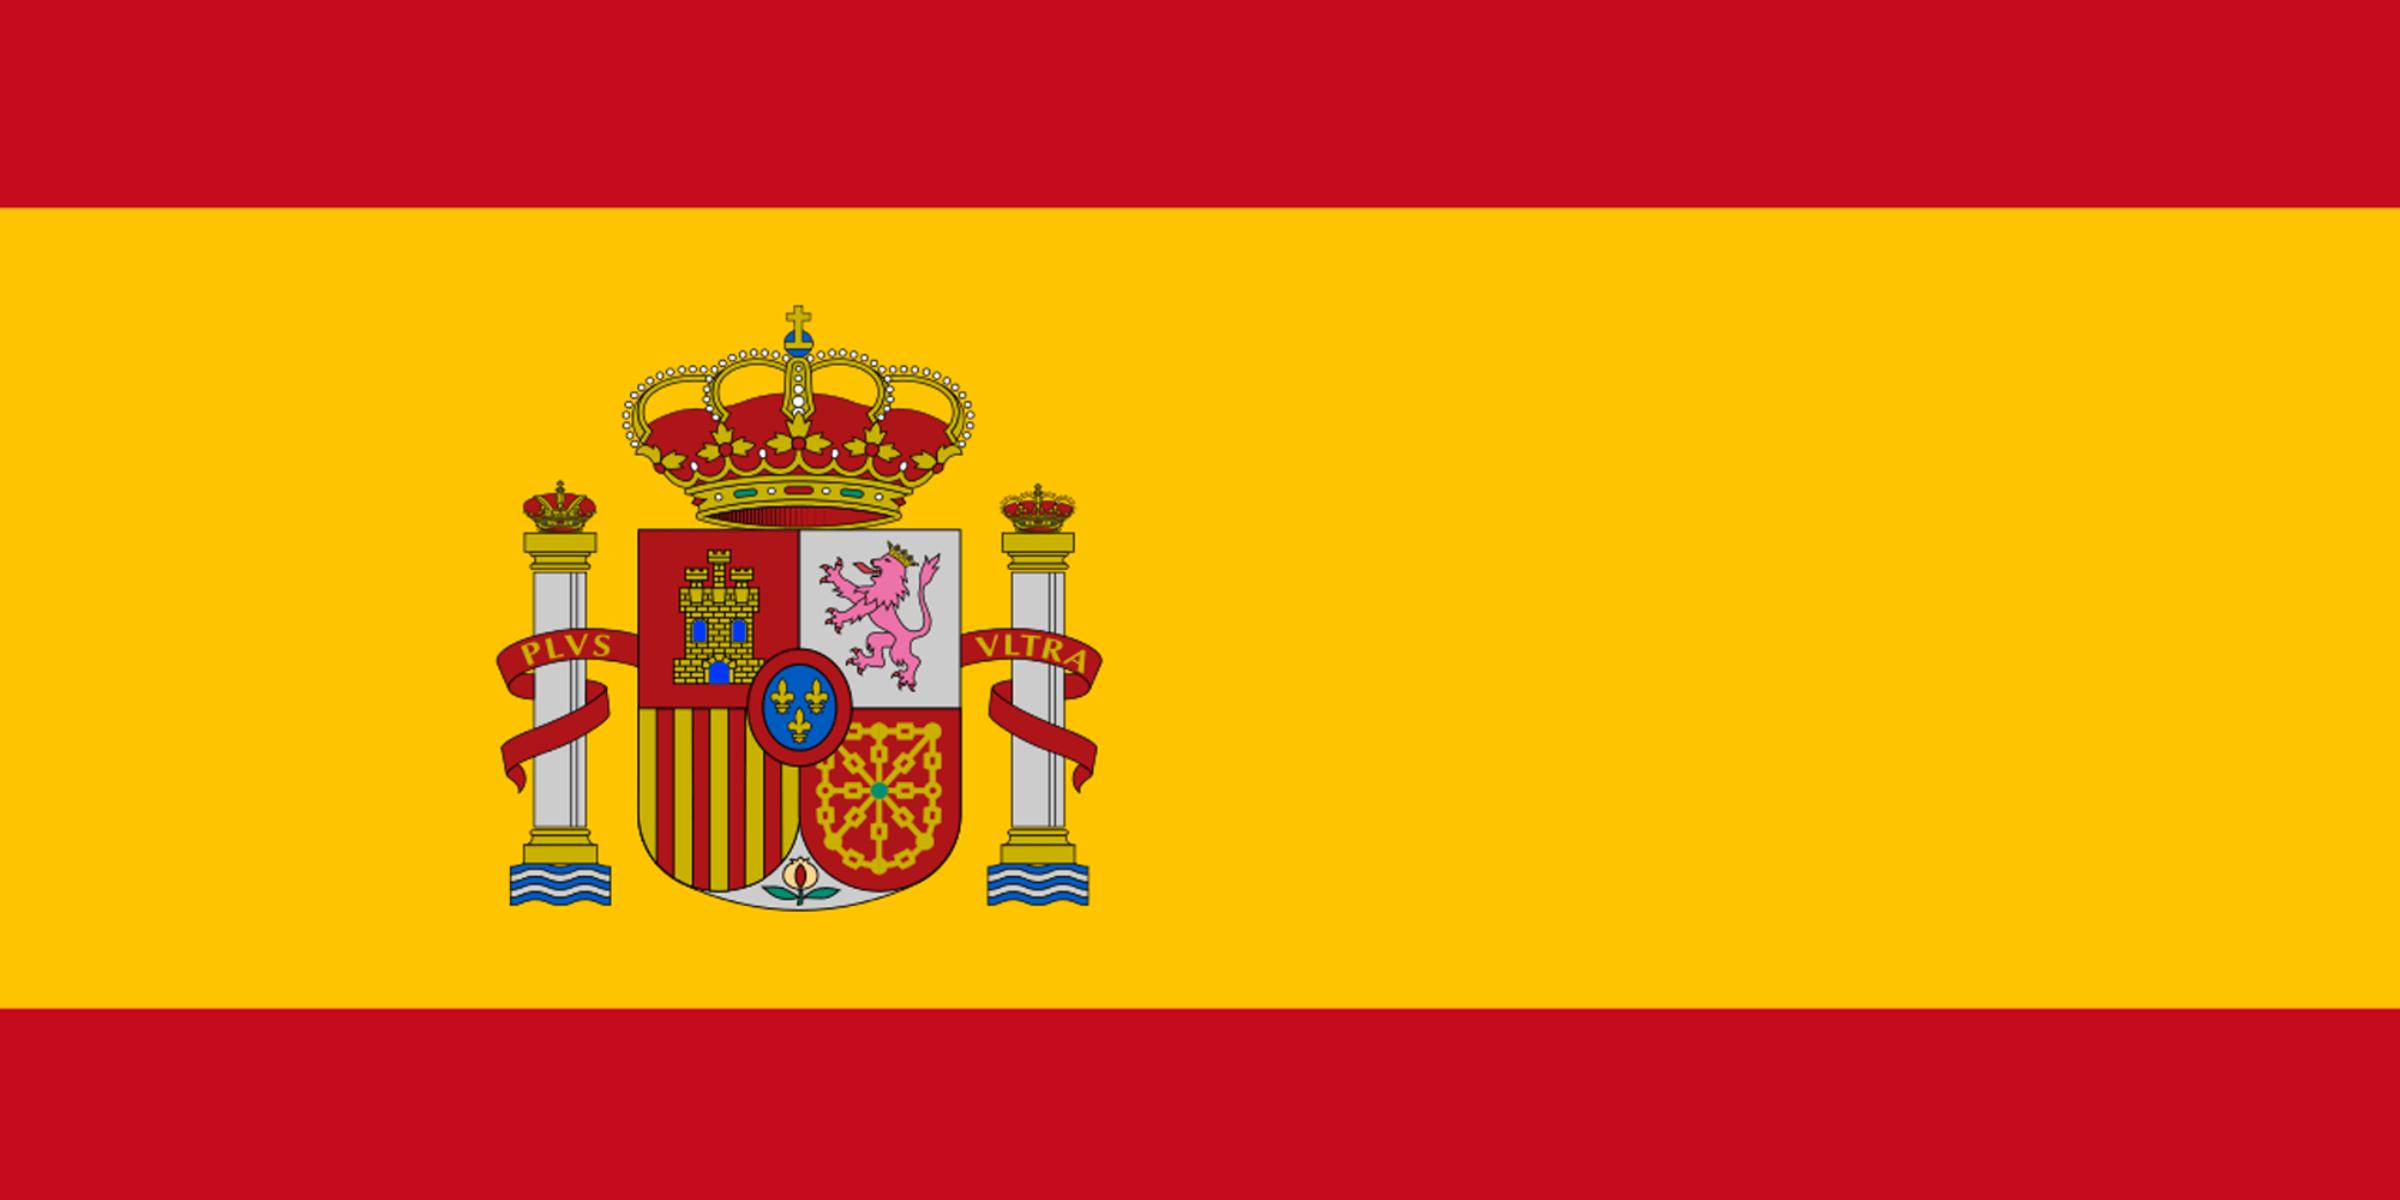 tour gratis oslo espanol.